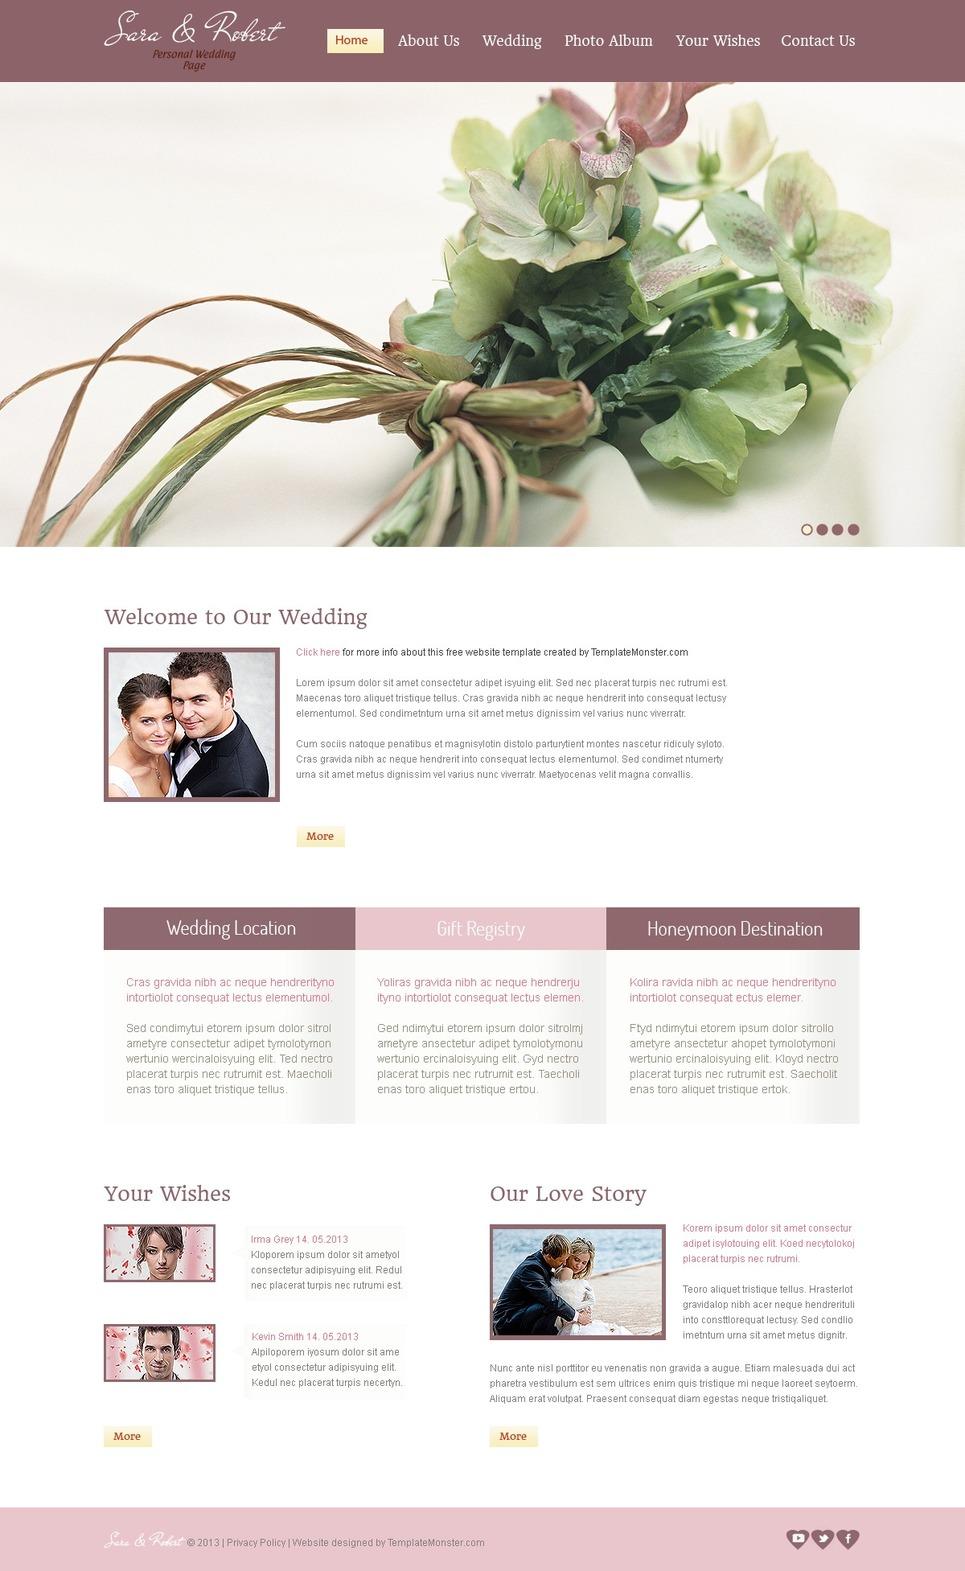 Empfohlene kostenlose christian dating website